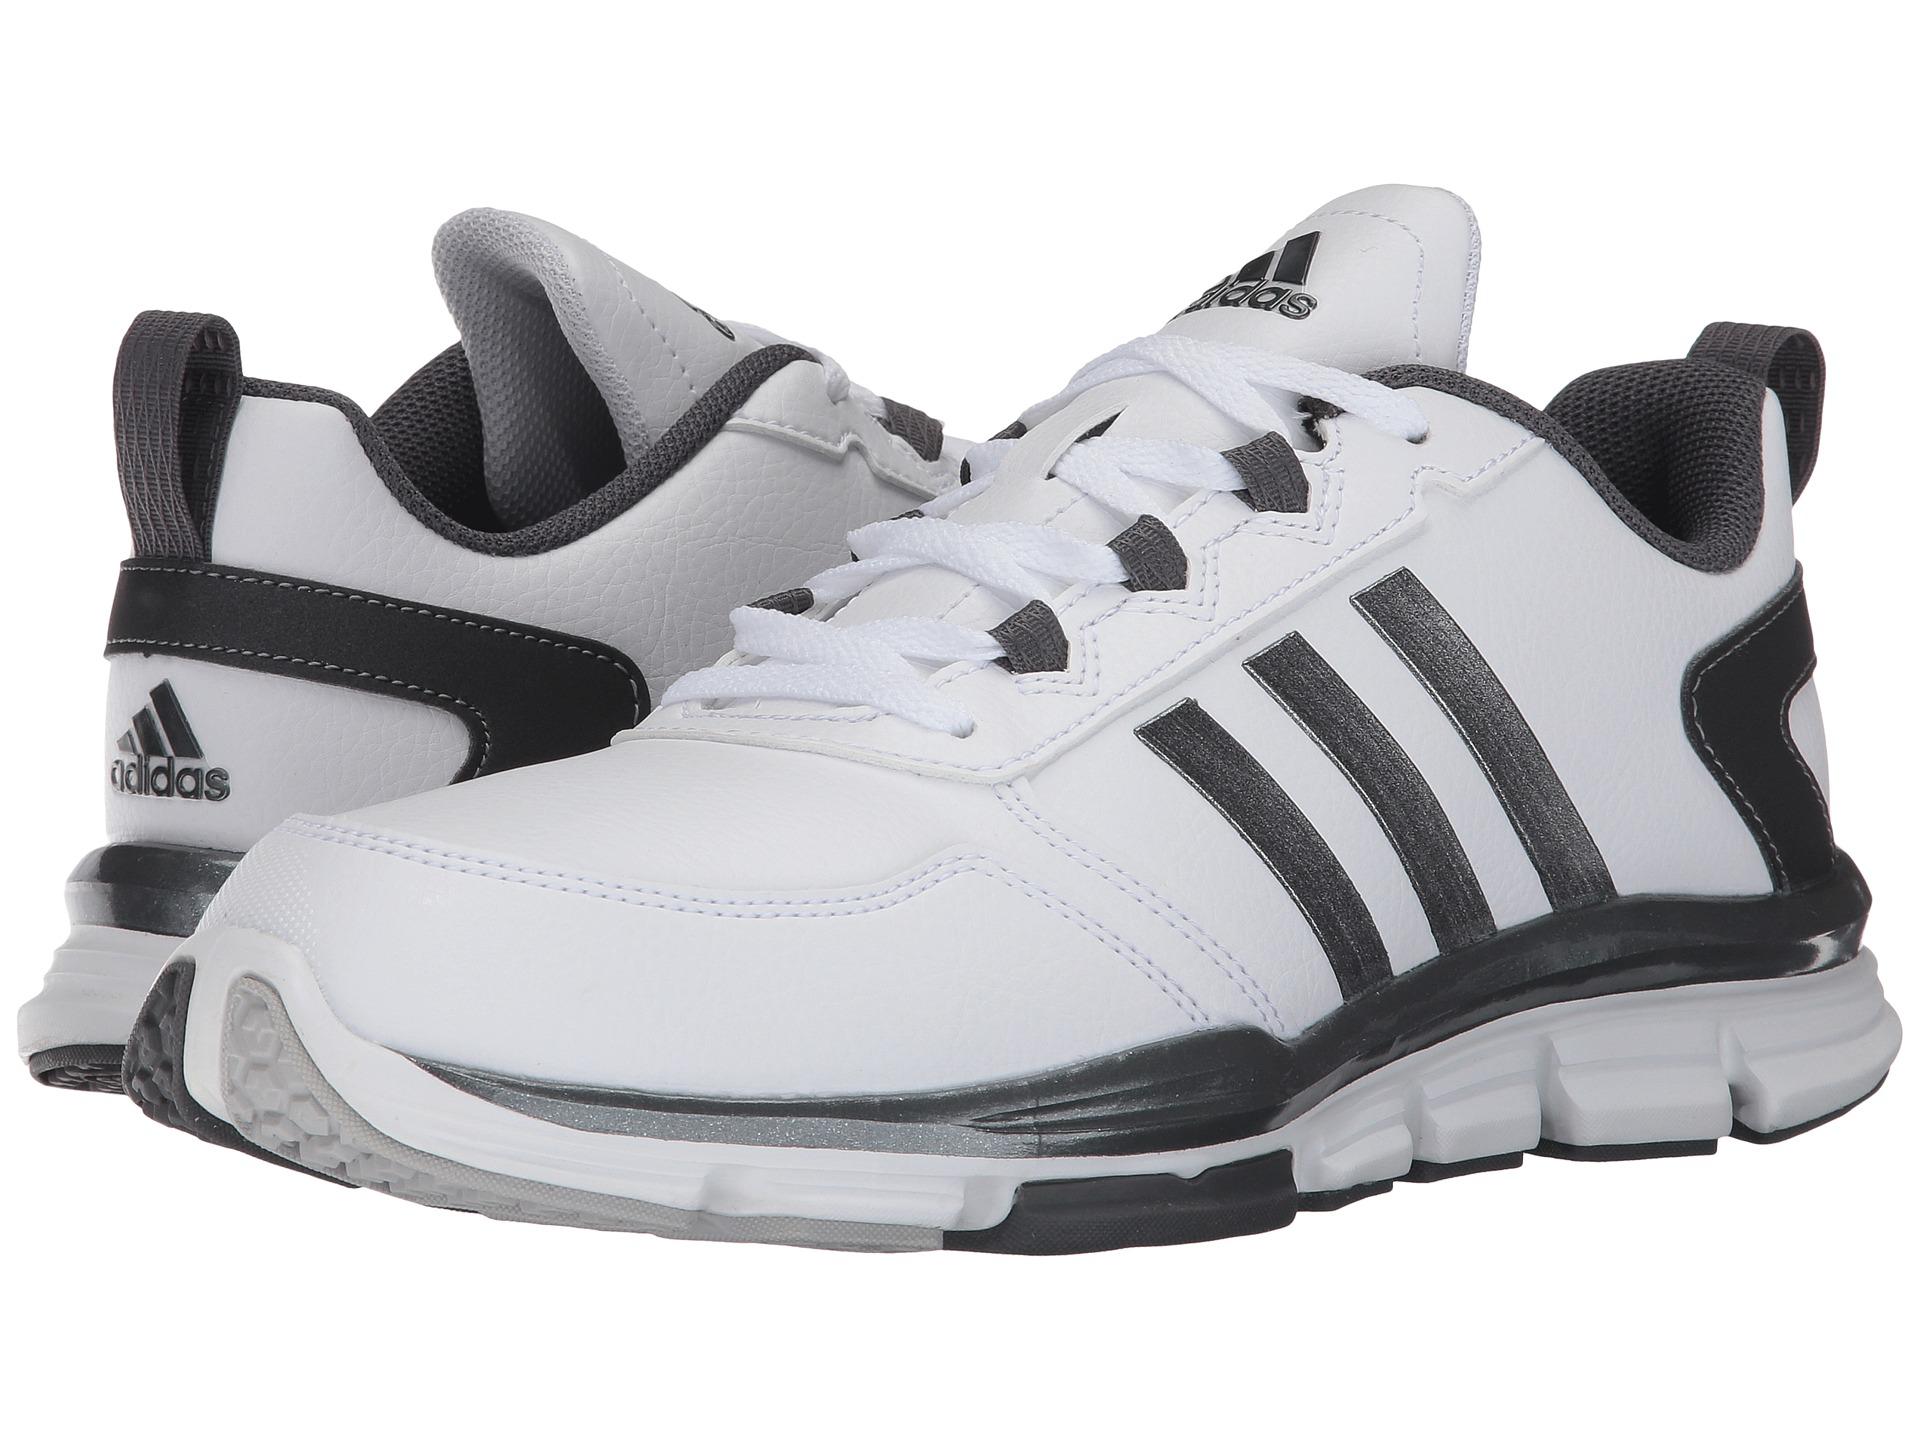 adidas Speed Trainer 2 SLT at 6pm.com